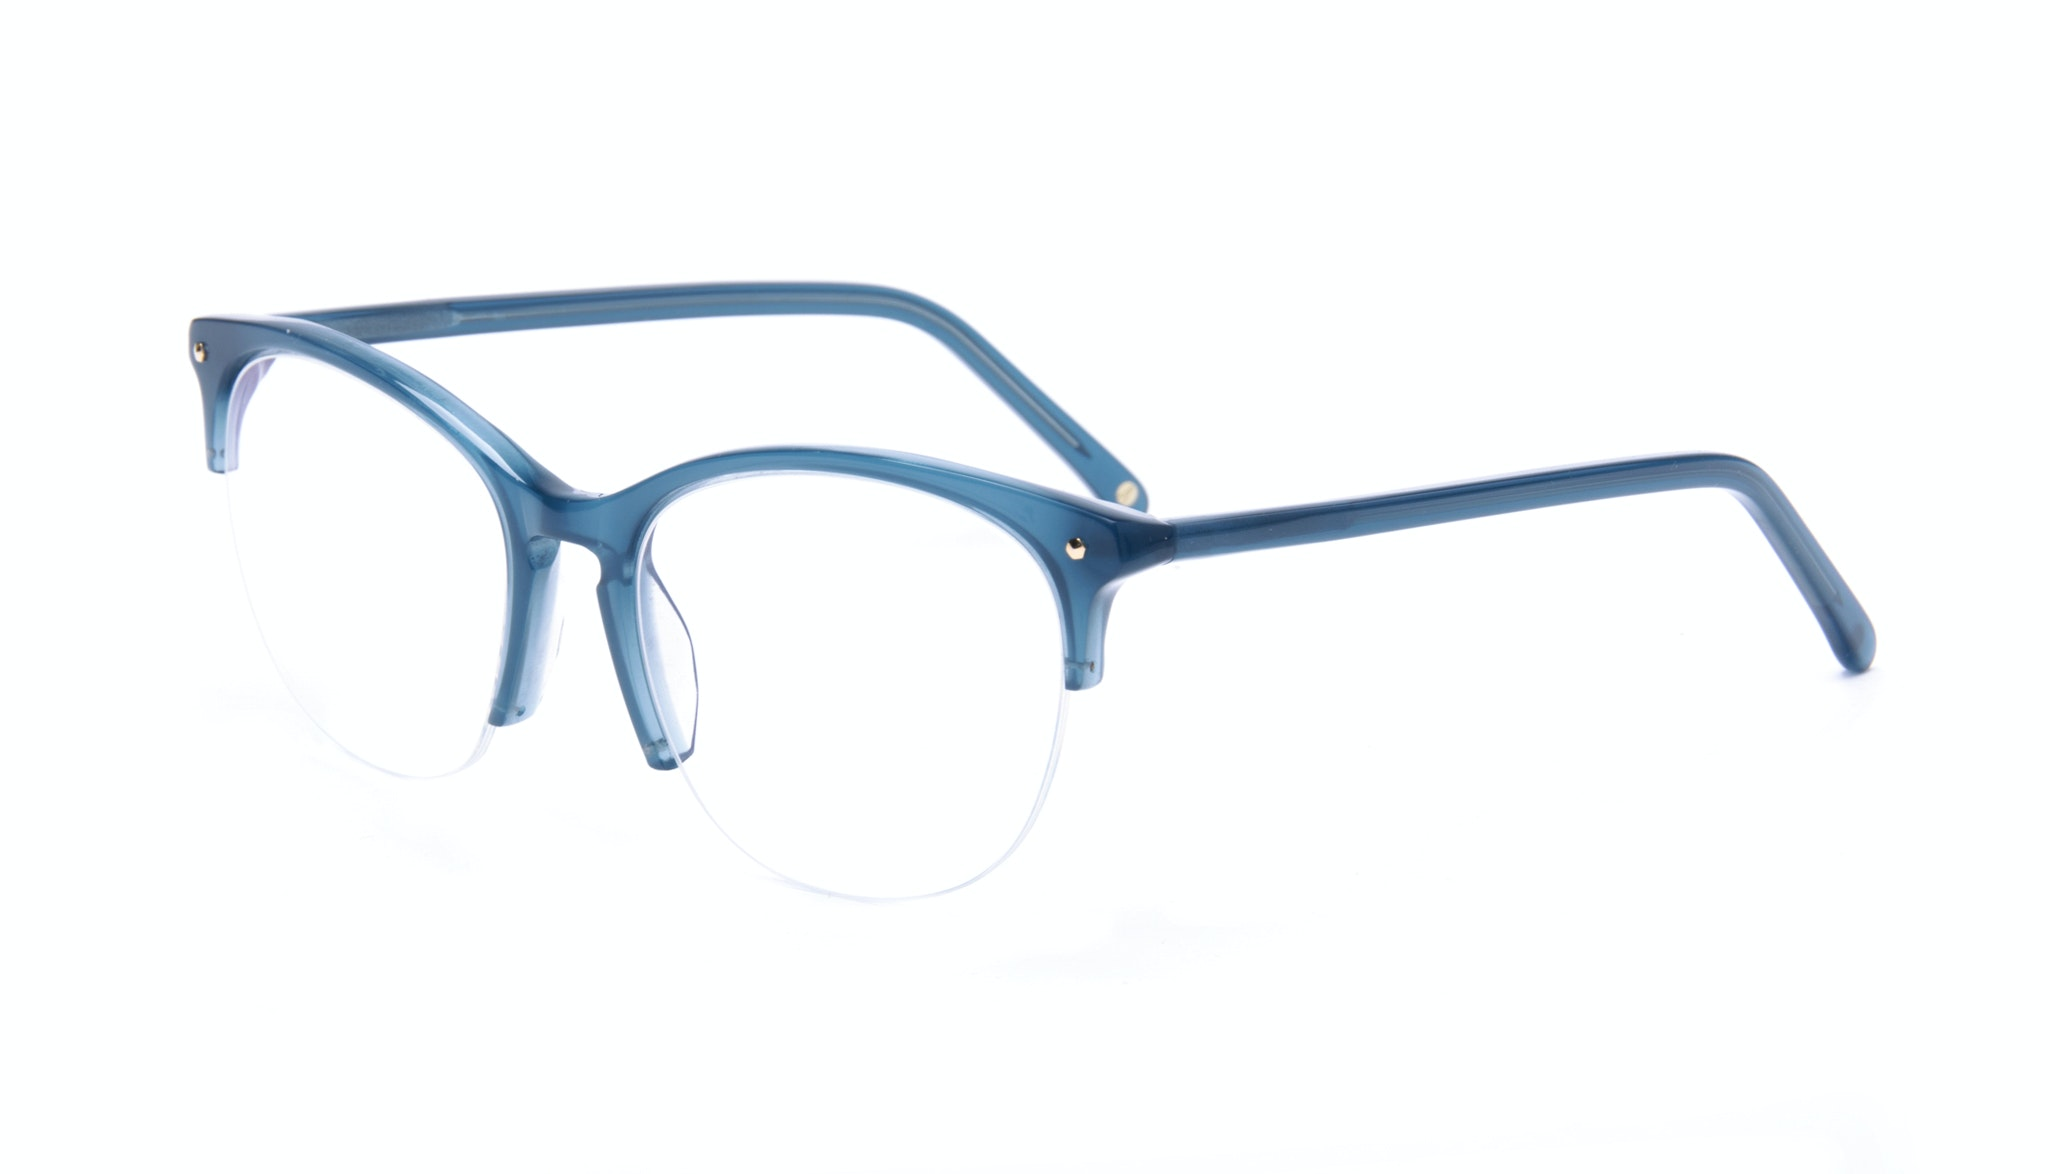 Affordable Fashion Glasses Rectangle Square Round Semi-Rimless Eyeglasses Women Nadine Light Marine Tilt